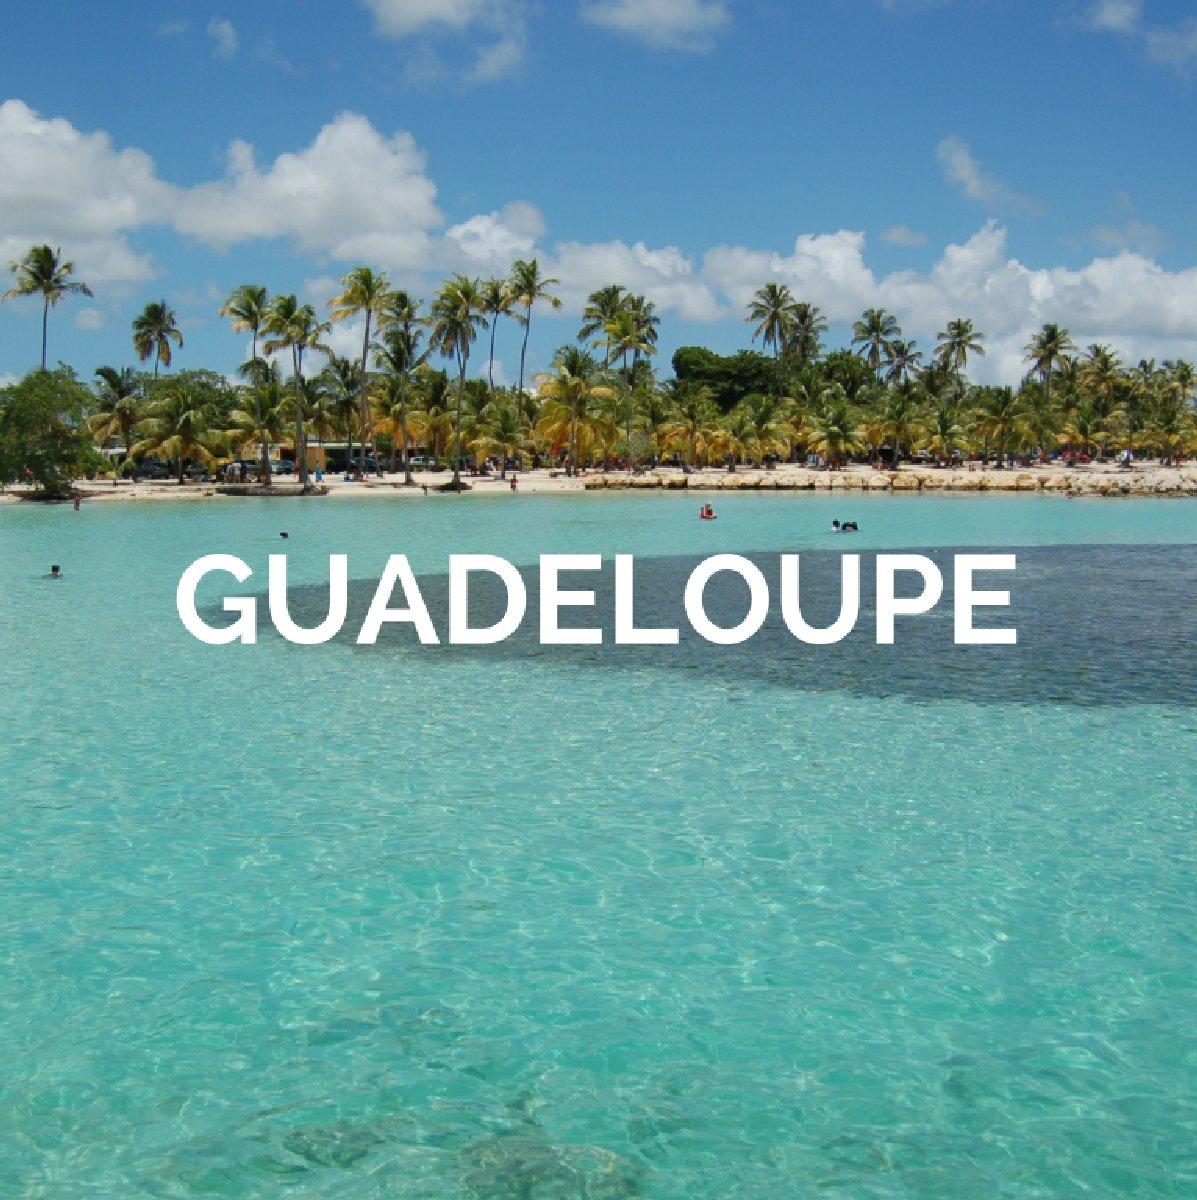 guadeloupe-dominica-catamaran-charter